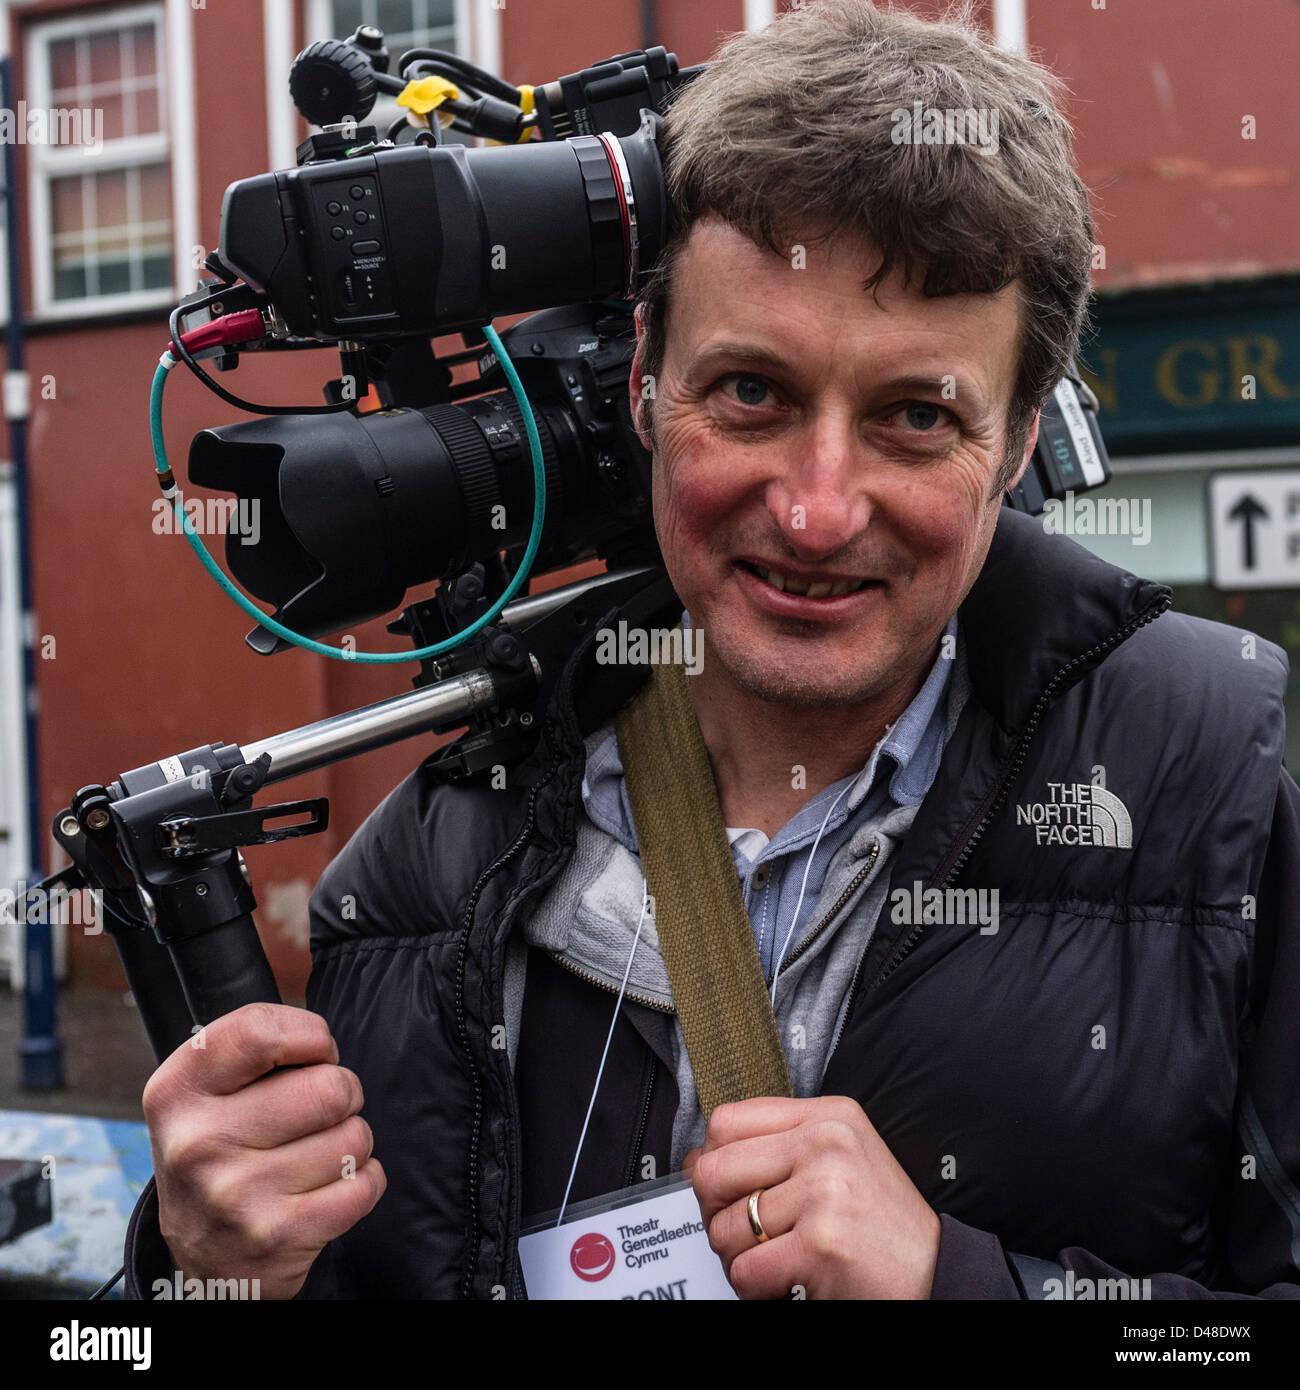 A professional videographer using a Nikon D800 dslr video camera in a shoulder rig, UK - Stock Image